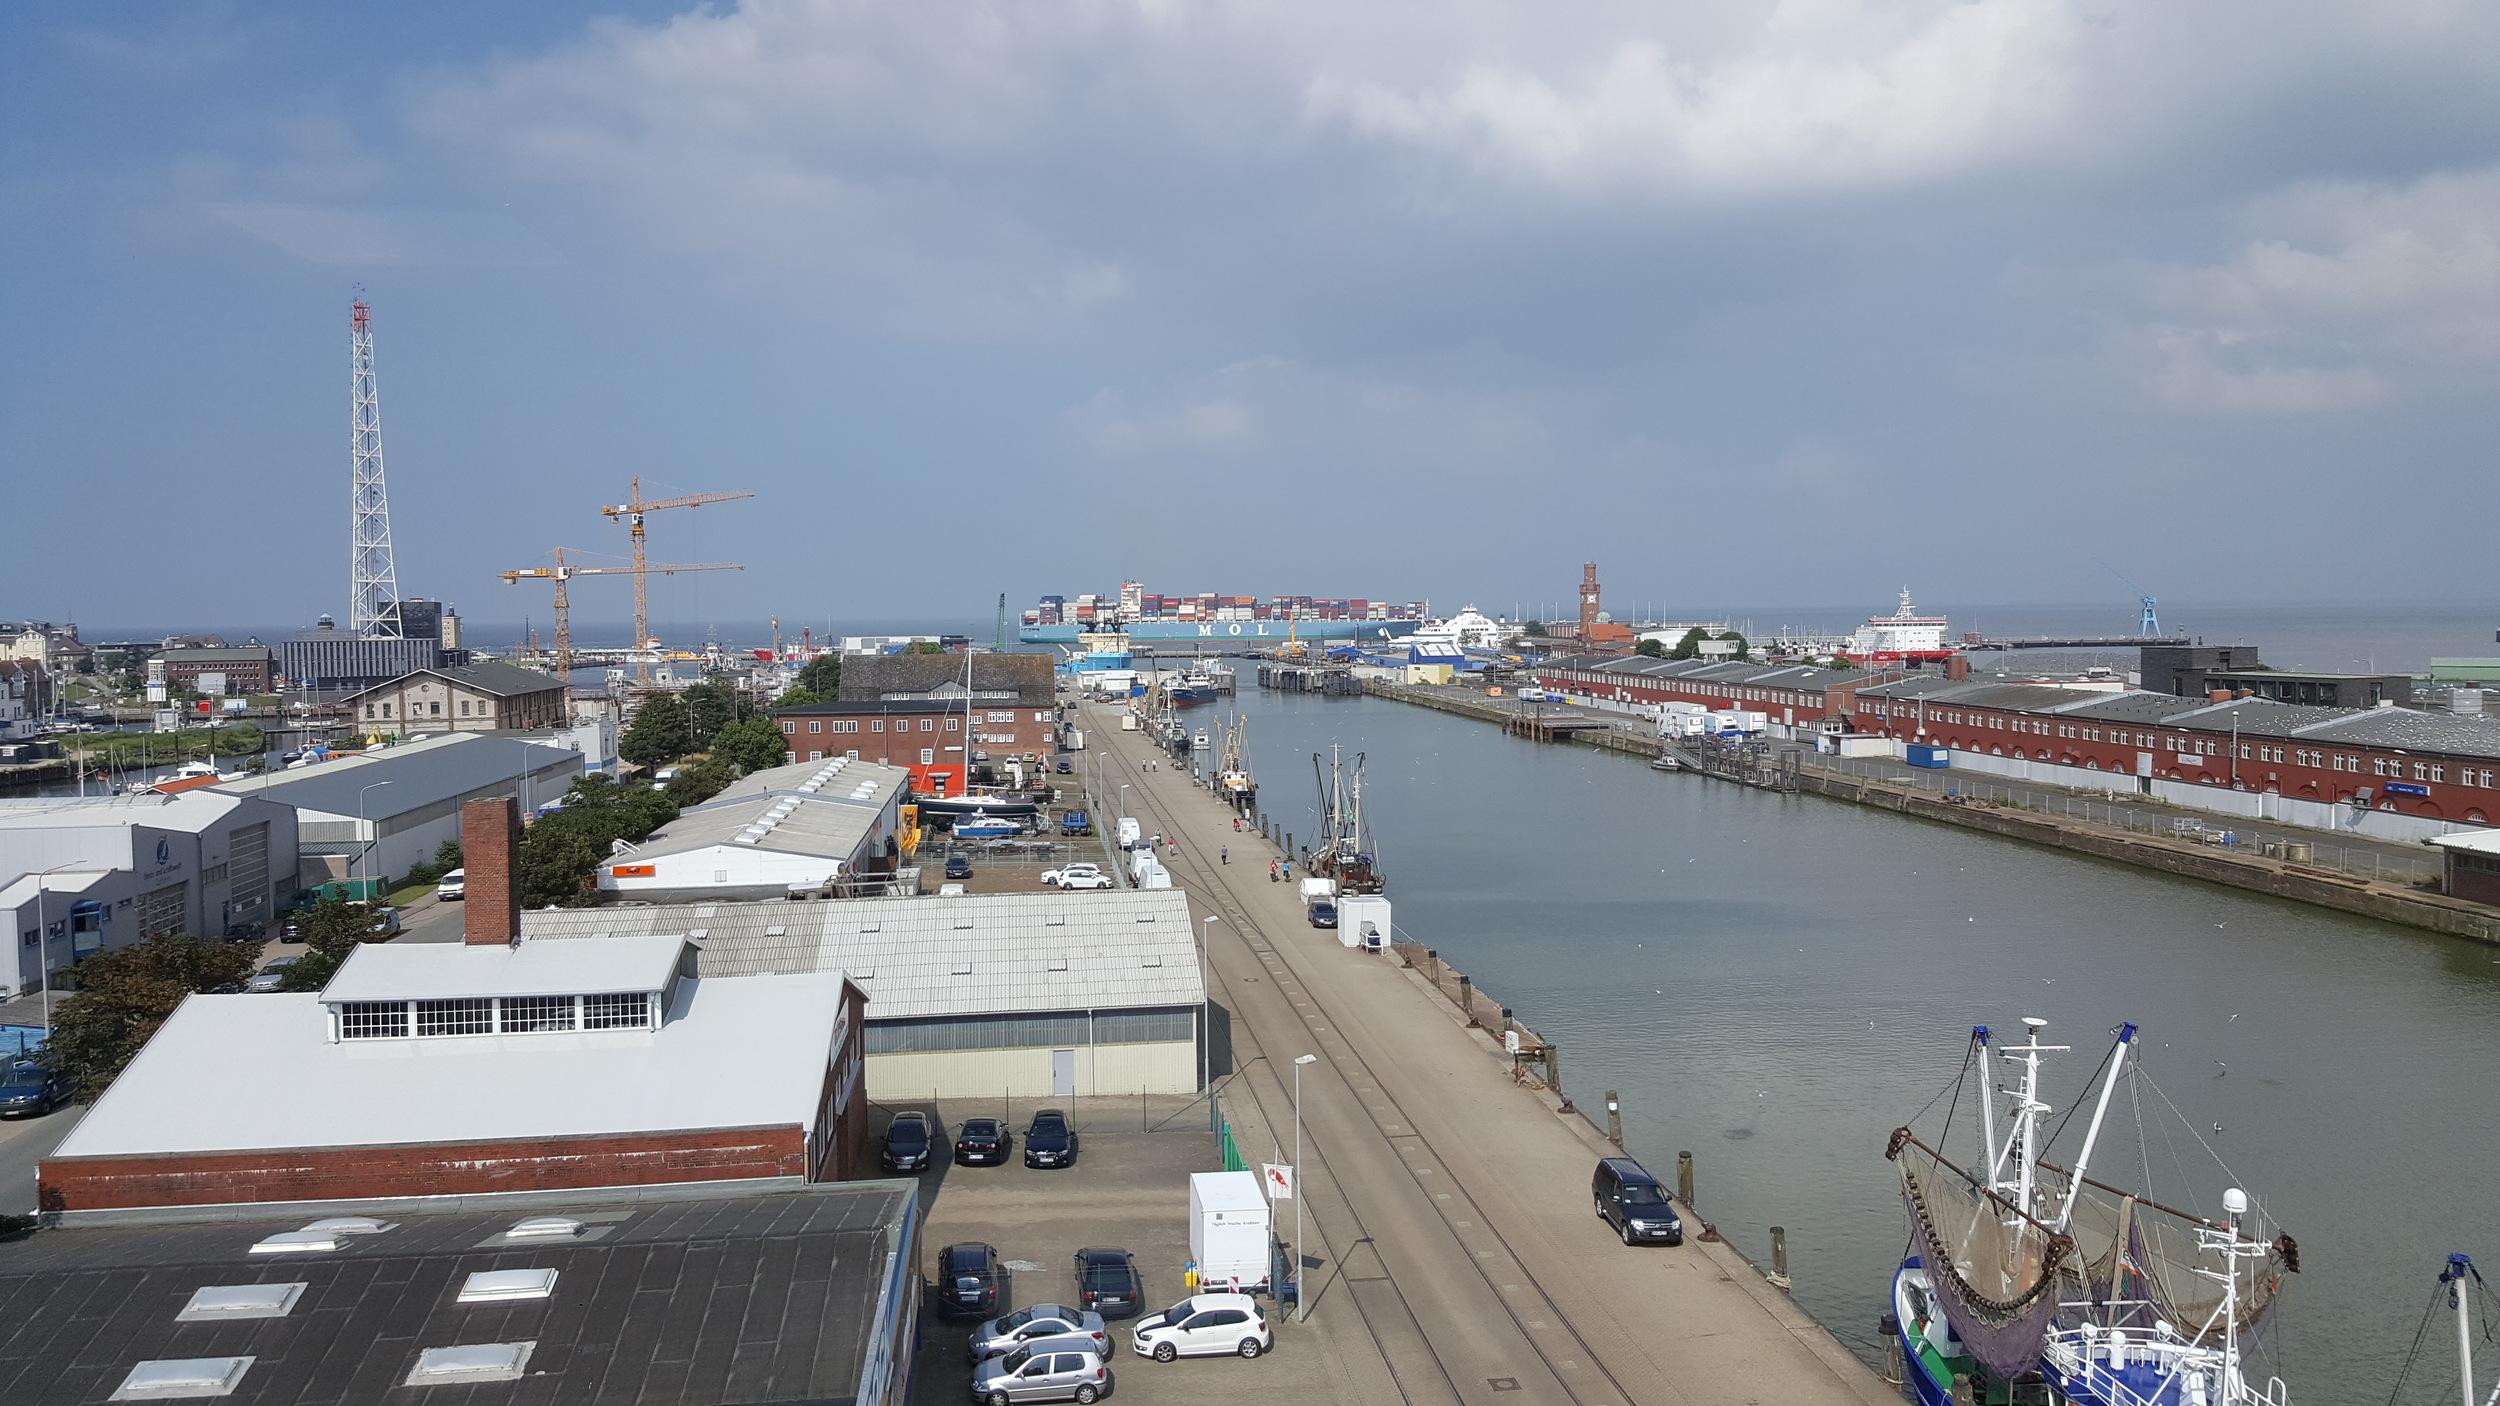 What a big MOL ship passing by along its way to Hamburg!